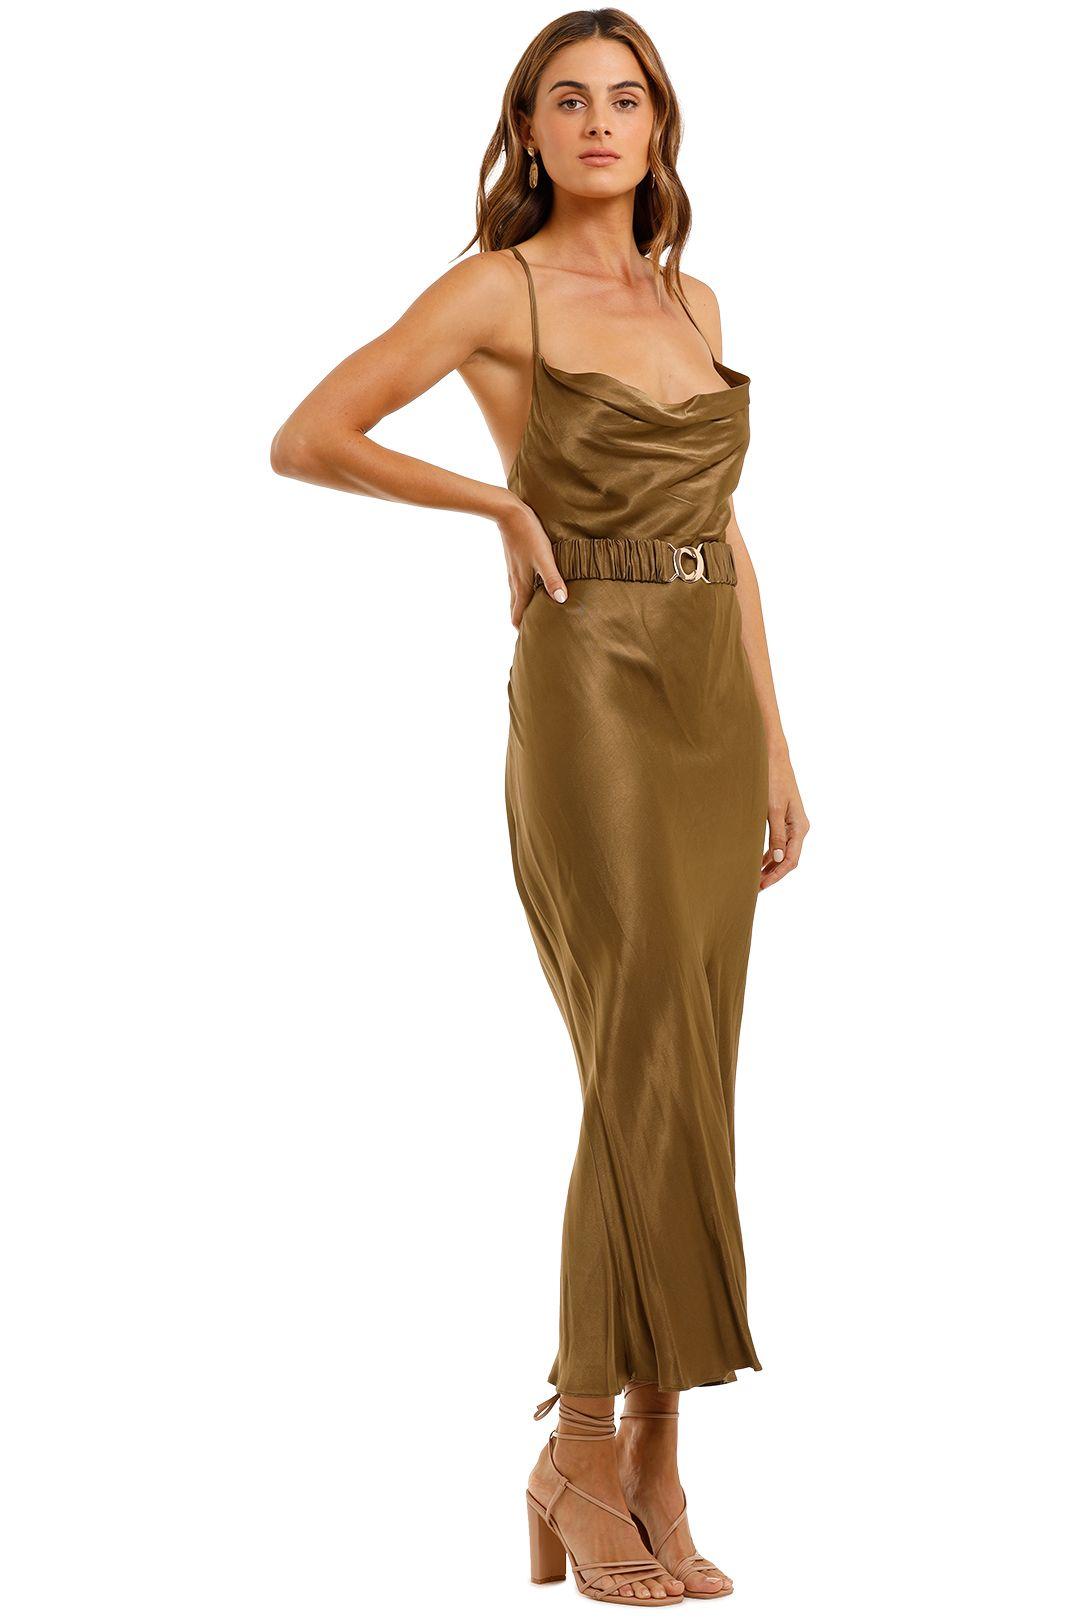 Shona Joy Gala Bias Midi Dress Olive